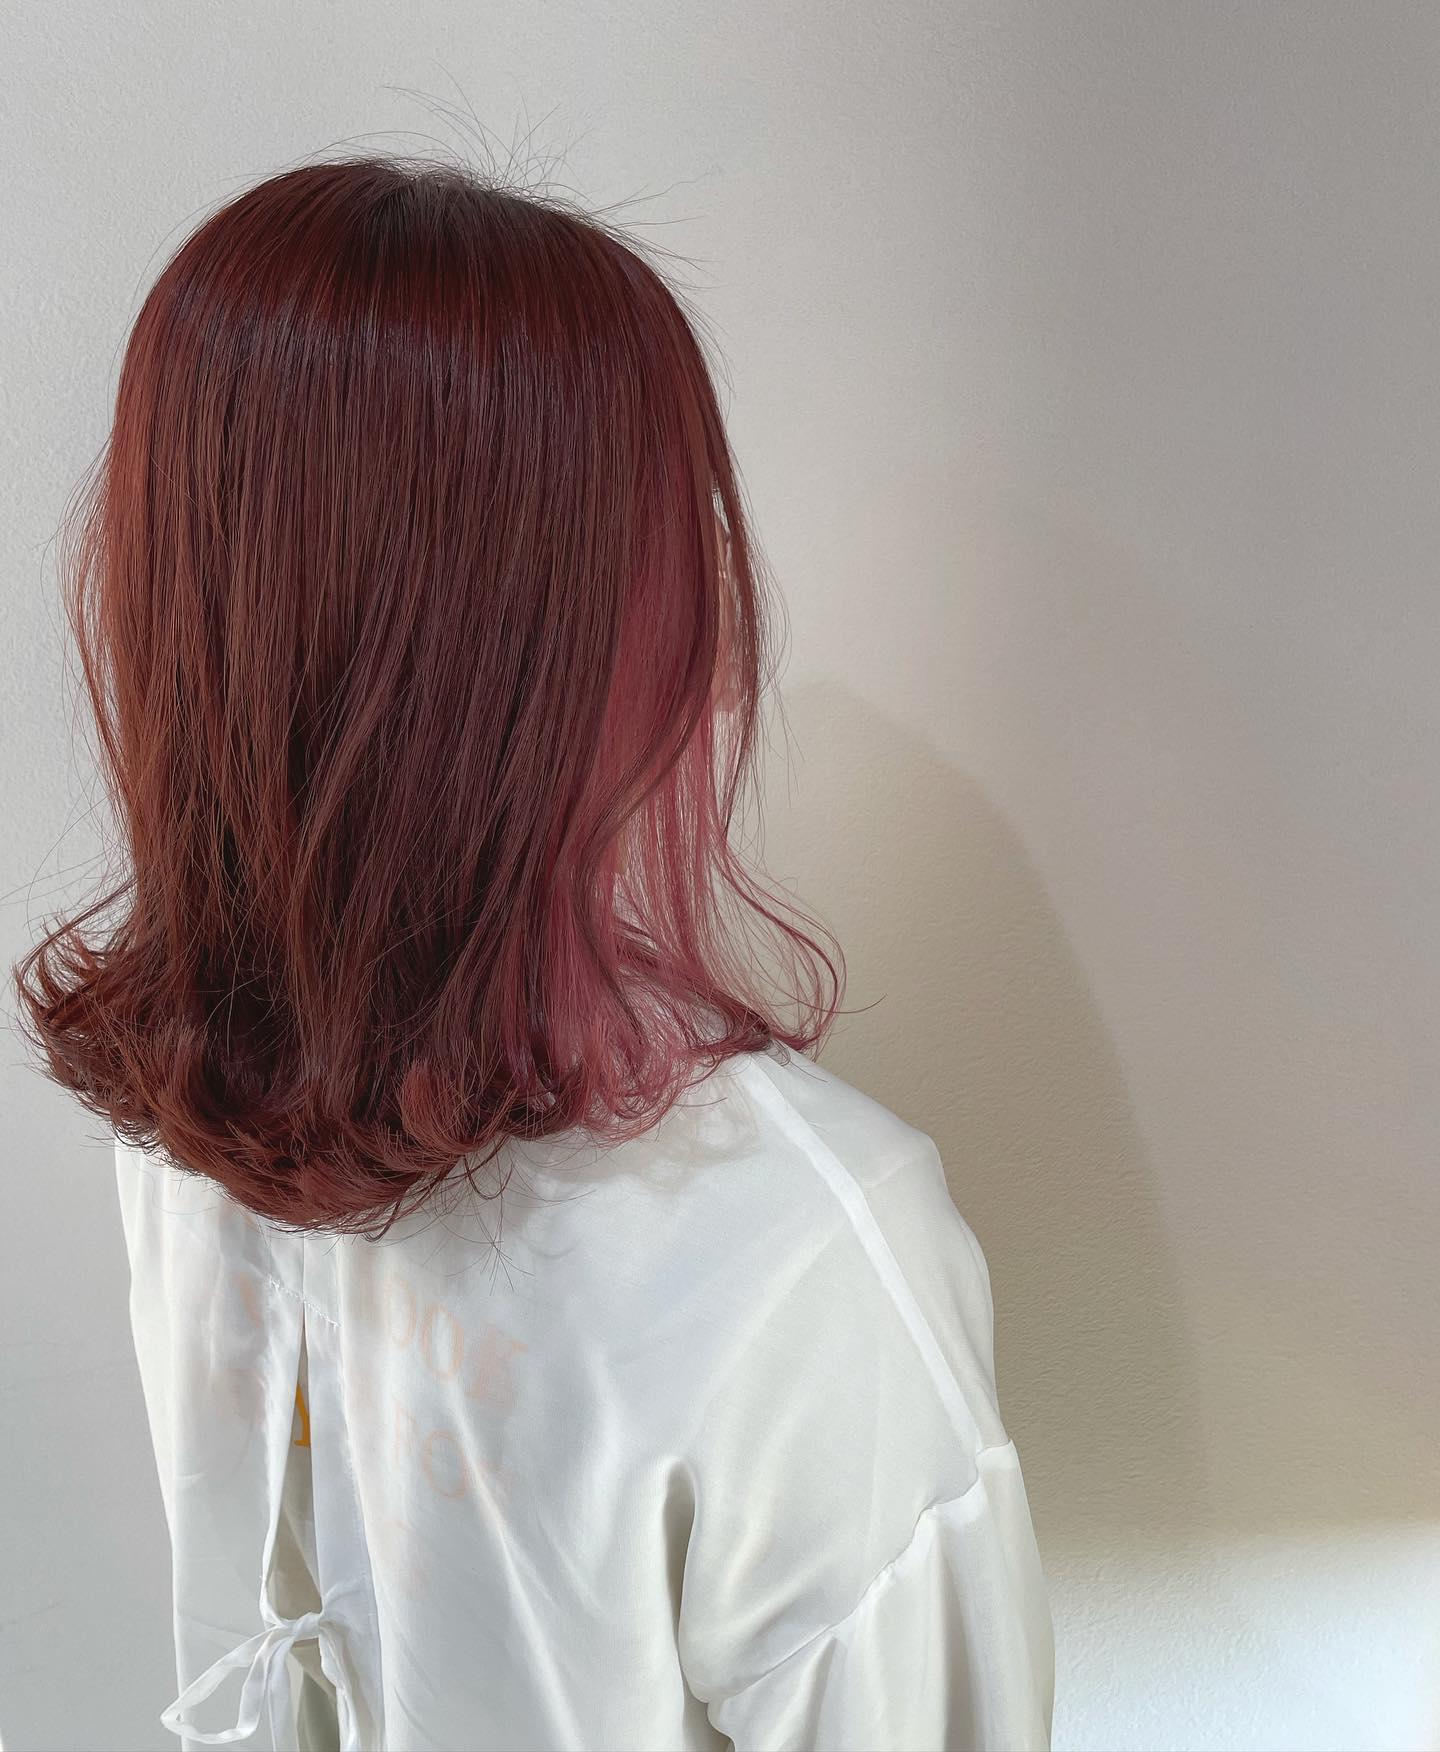 pink..#イヤリングカラー#ピンク#pink#ロブ#可愛い### ..〠627-0004京丹後市峰山町荒山1220-1︎0772608704close:Wednesday